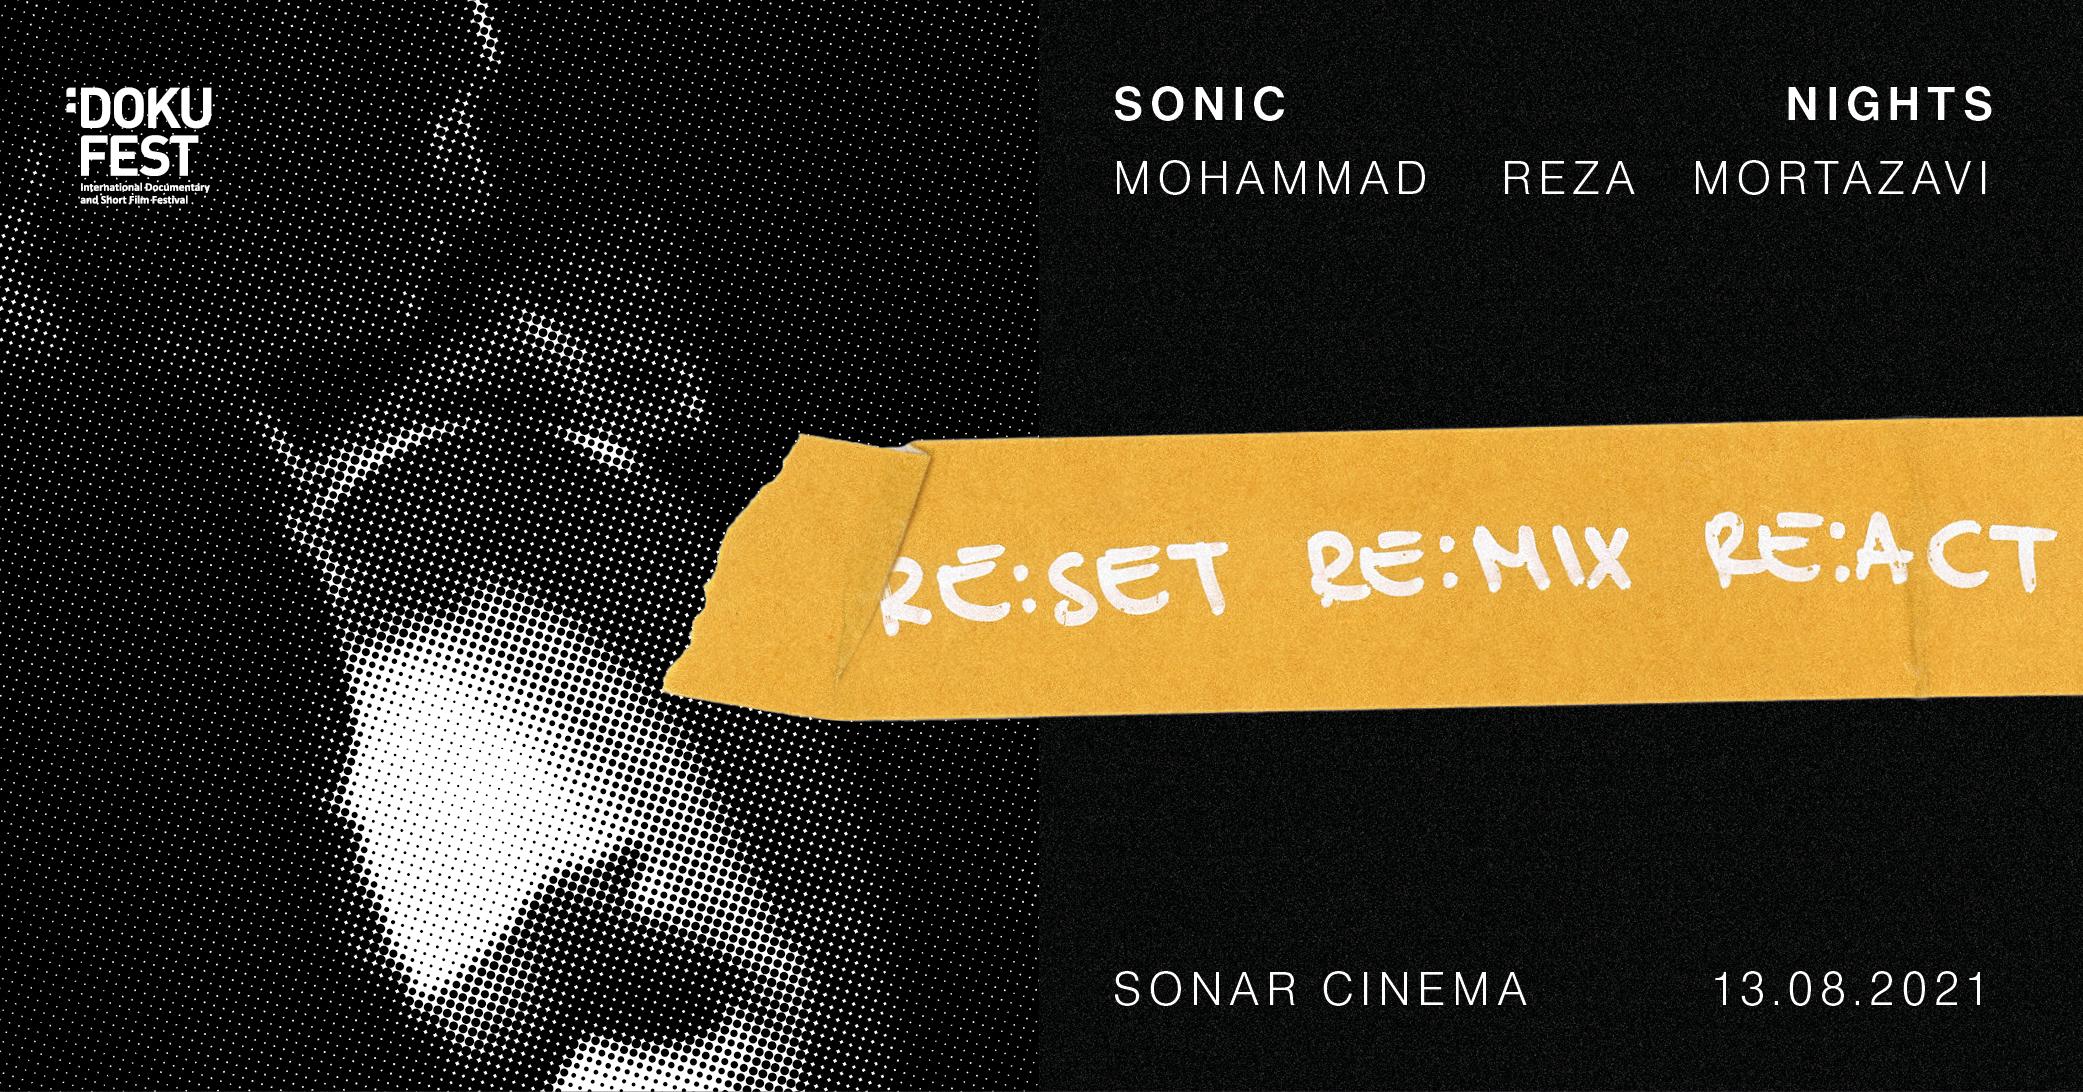 MOHAMMAD REZA MORTAZAVI SOLO PERFORMANCE @SONIC NIGHTS